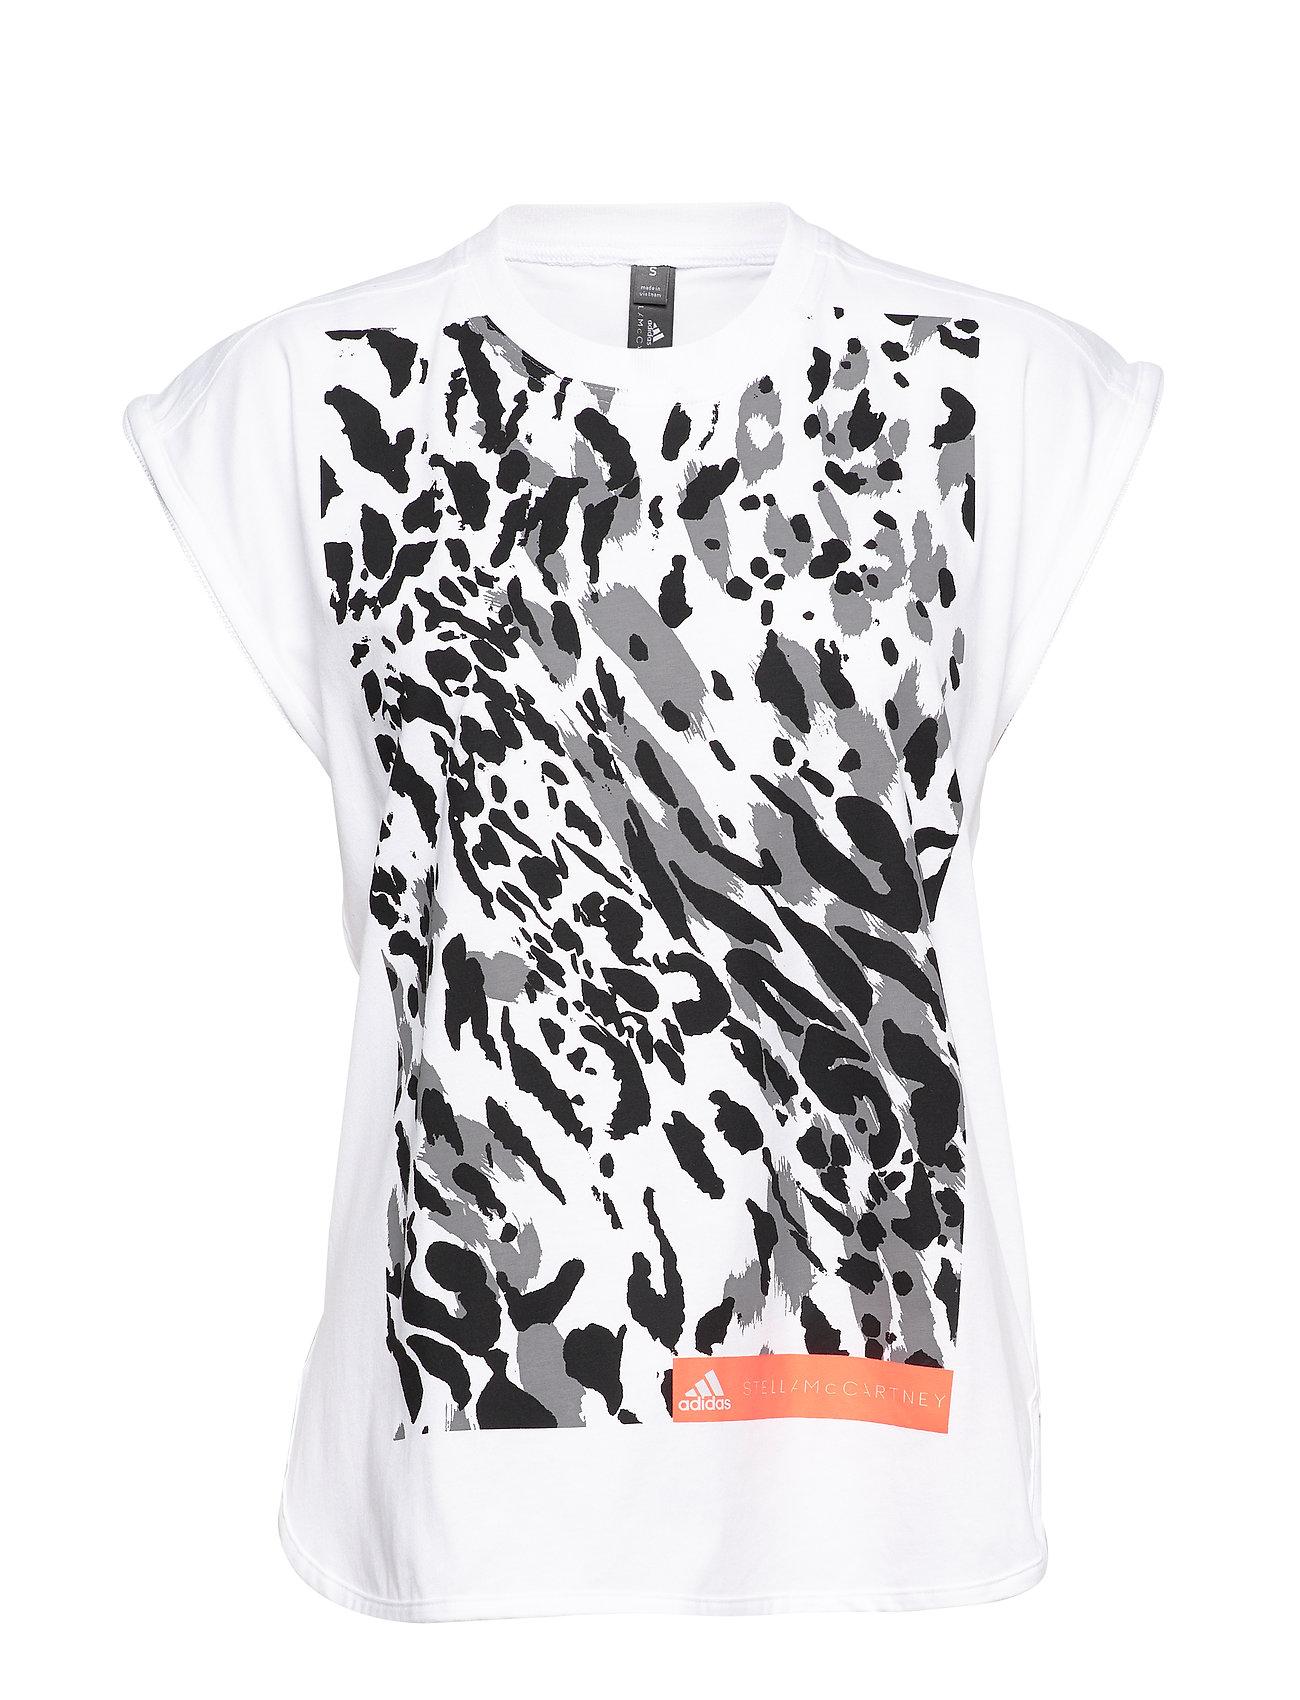 adidas by Stella McCartney GRAPHIC TANK - WHITE